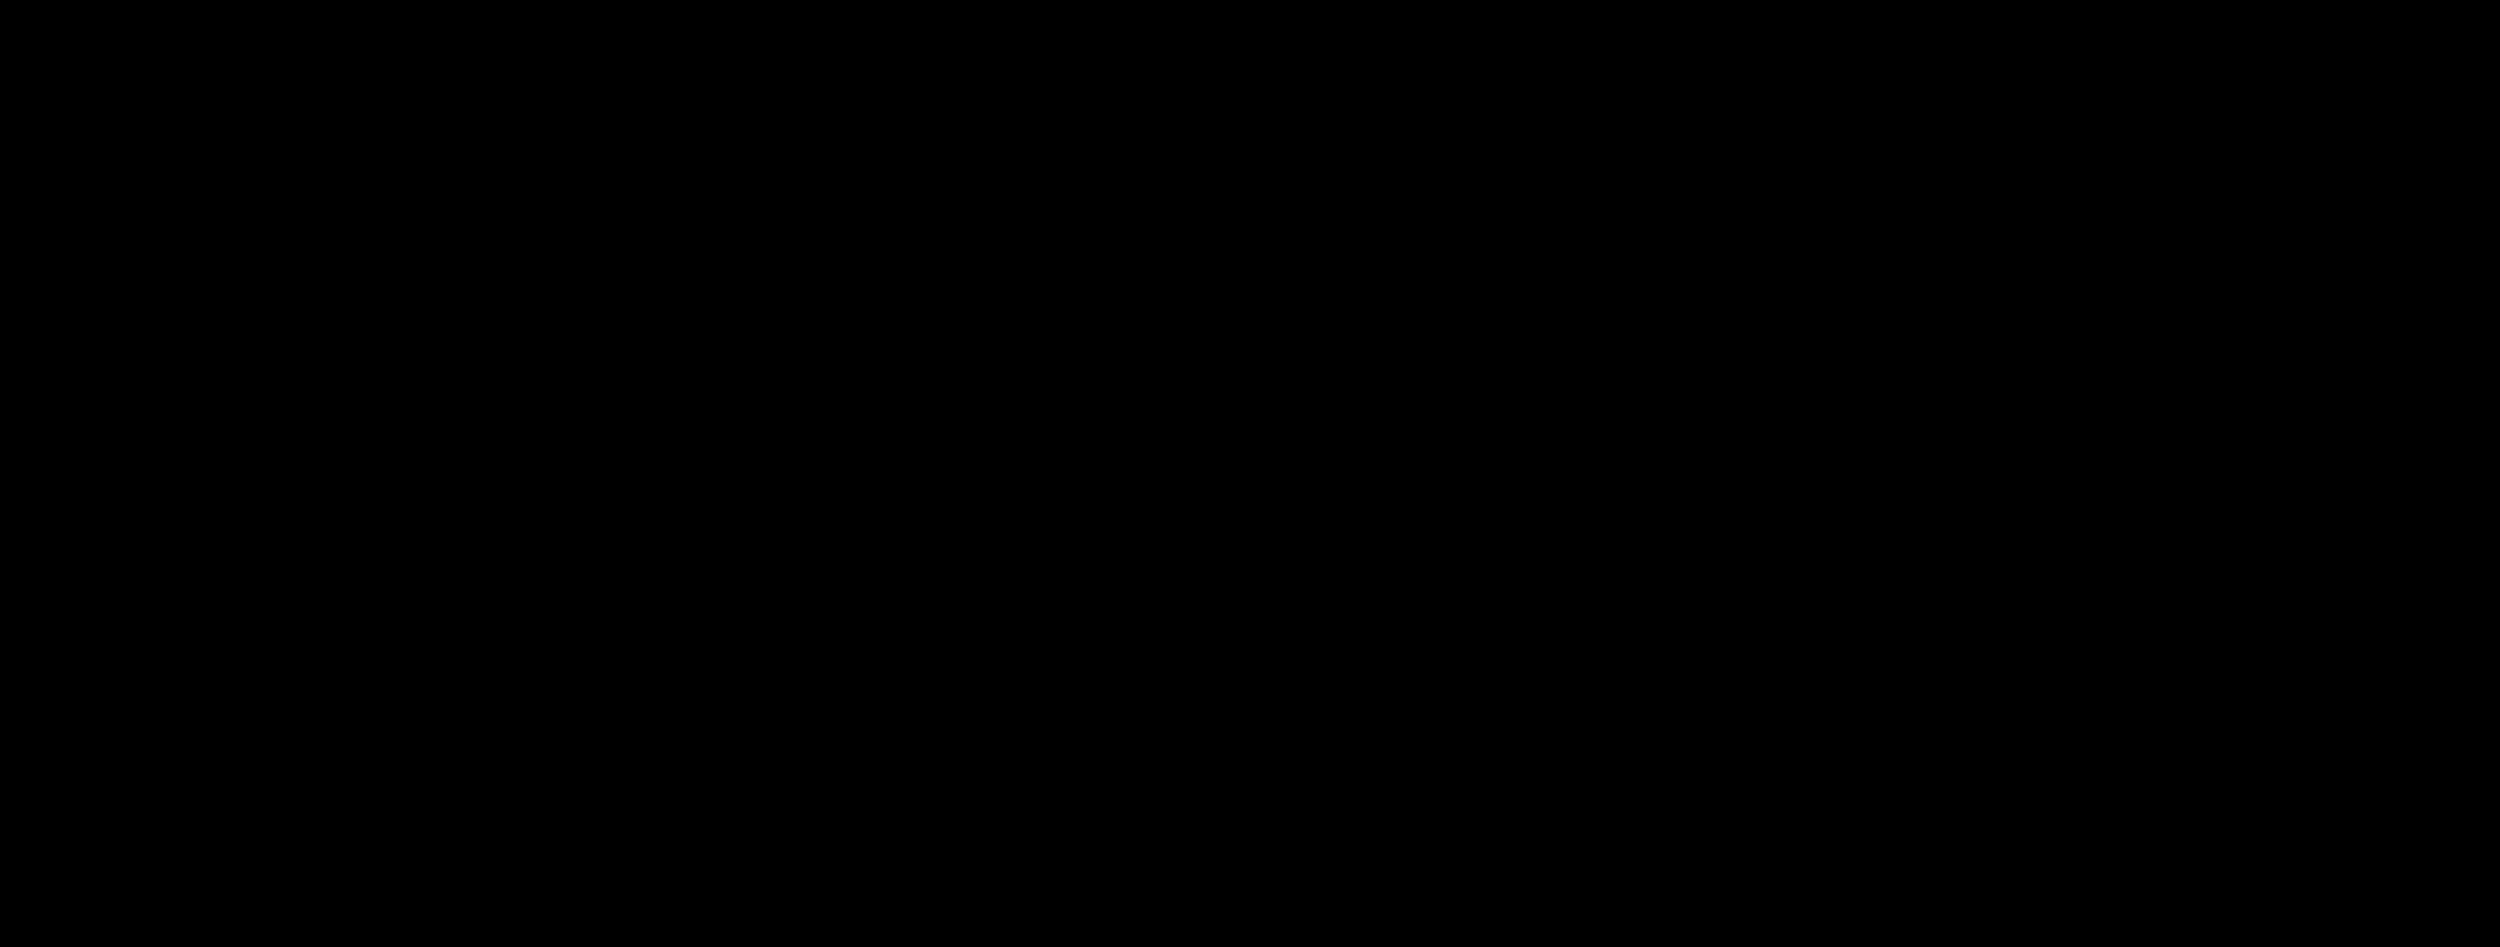 Rosetta.png